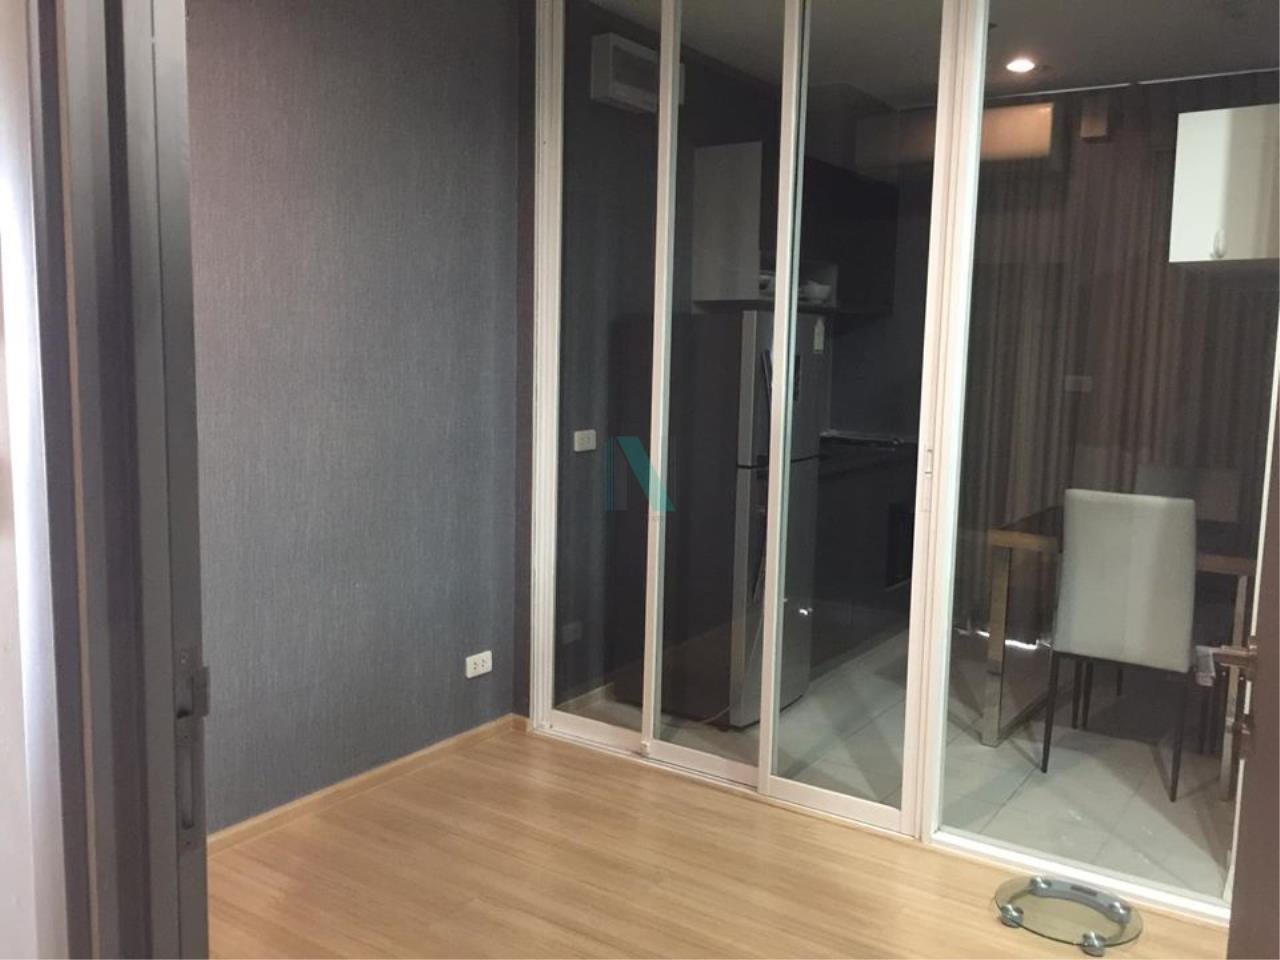 NOPPON REAL ESTATE CO.,LTD. Agency's NR09373. For Rent The Base Rama 9 - Ramkhamhaeng, 1 bedroom 28th floor near Airport Link Ramkhamhaeng. 7